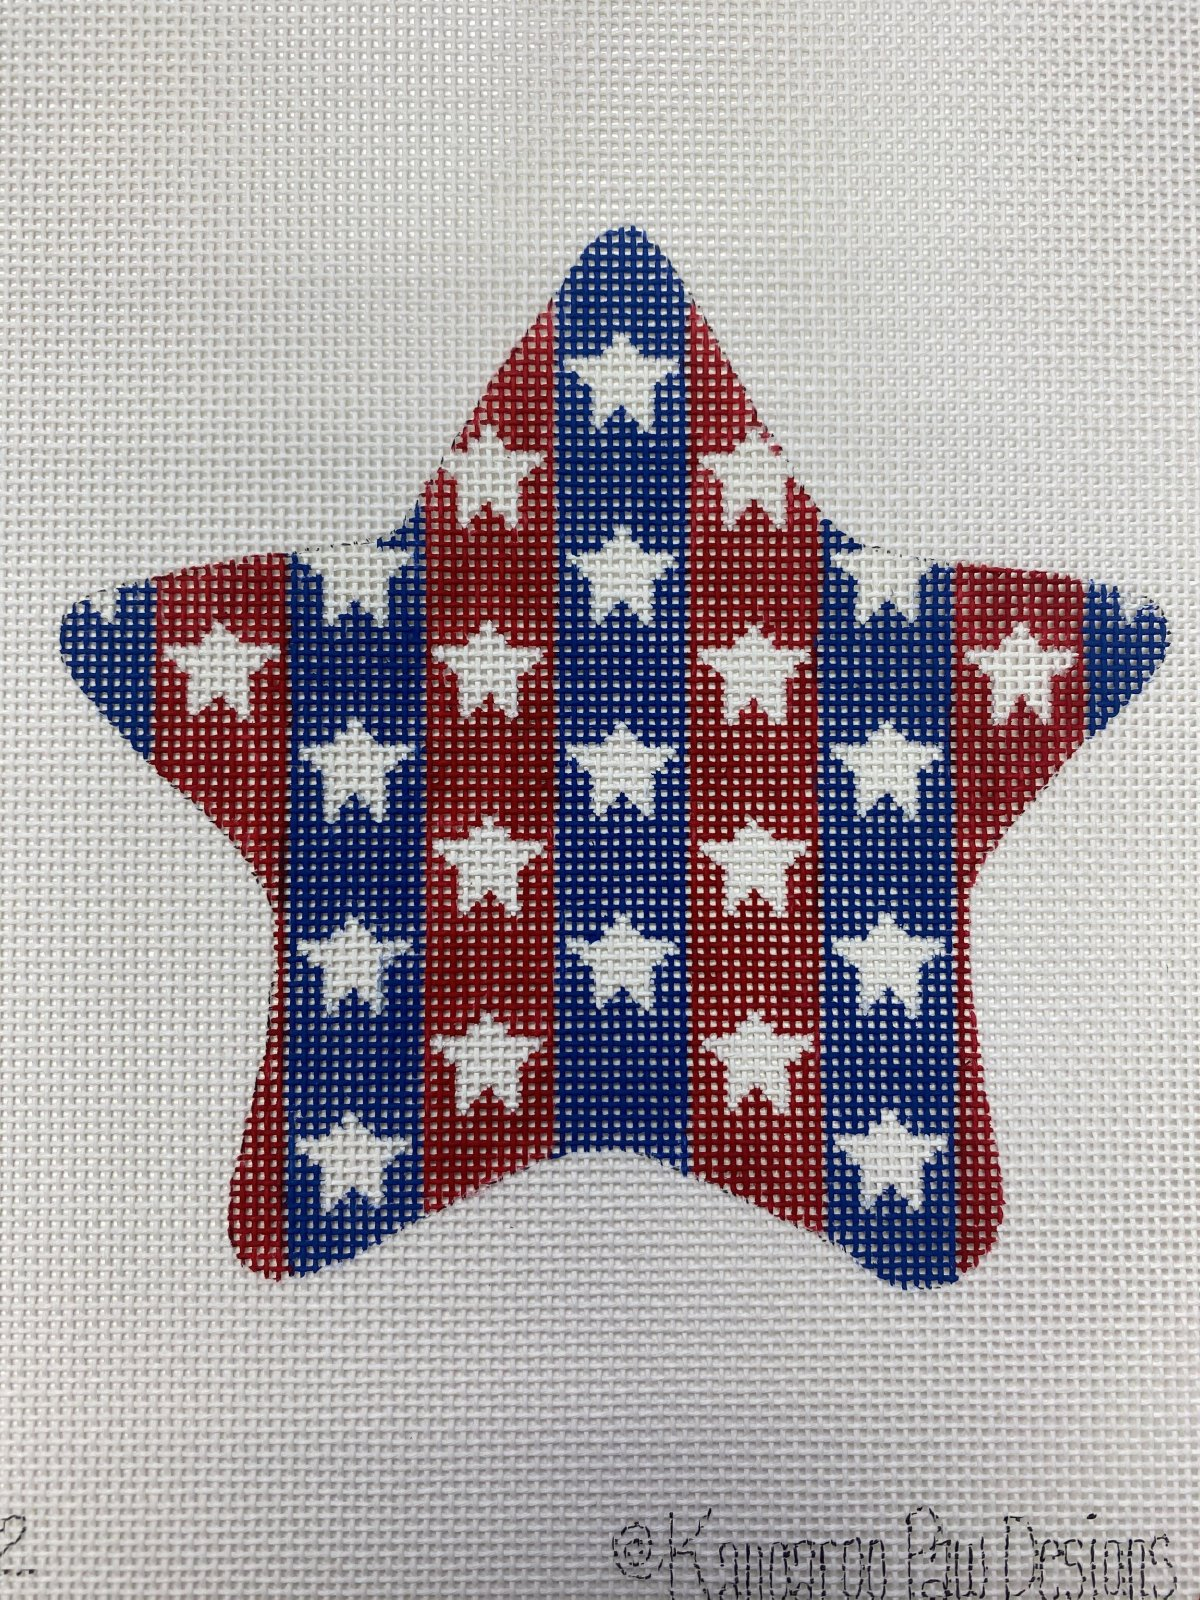 Patriotic Star - Stars and Stripes